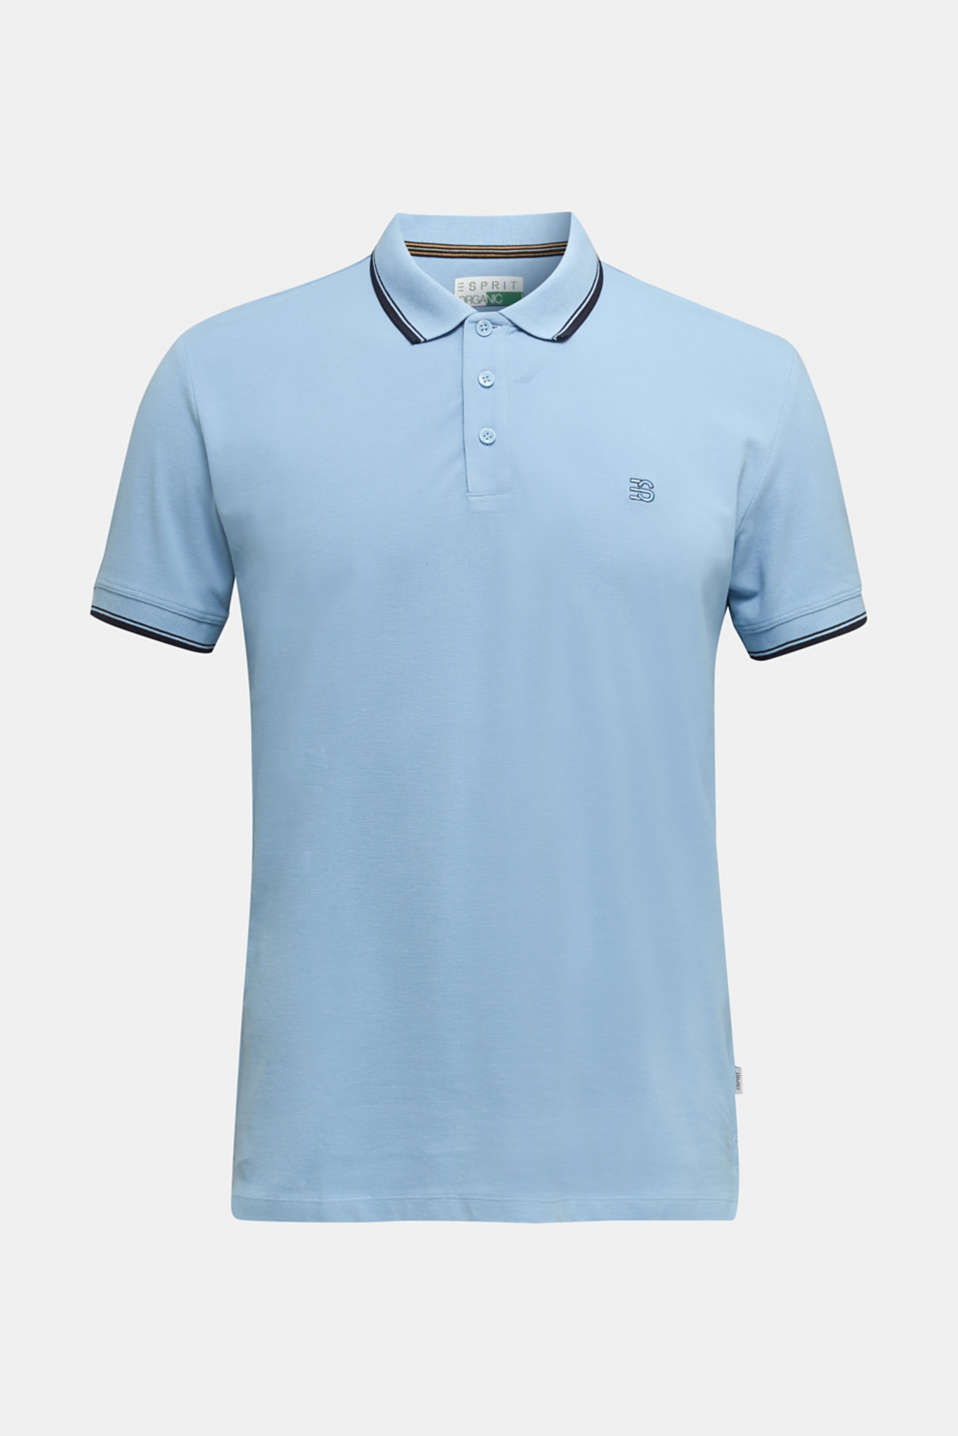 Piqué polo shirt in 100% cotton, LIGHT BLUE, detail image number 5